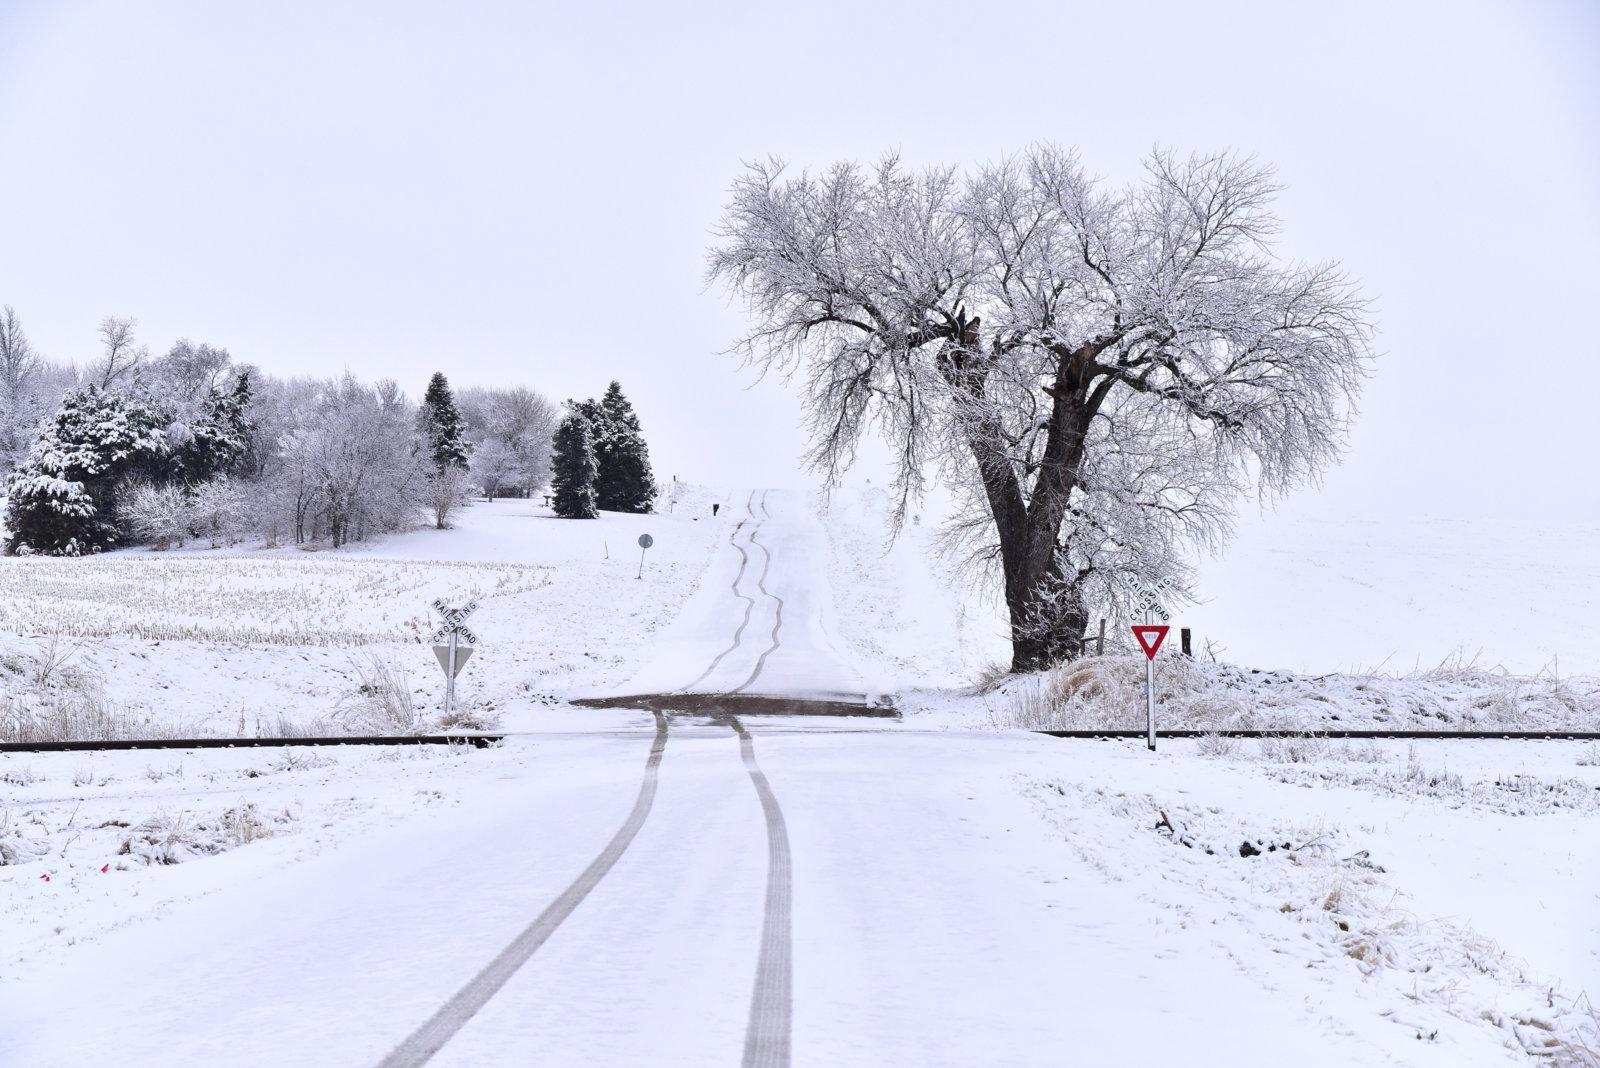 The road I drove_031420.JPG